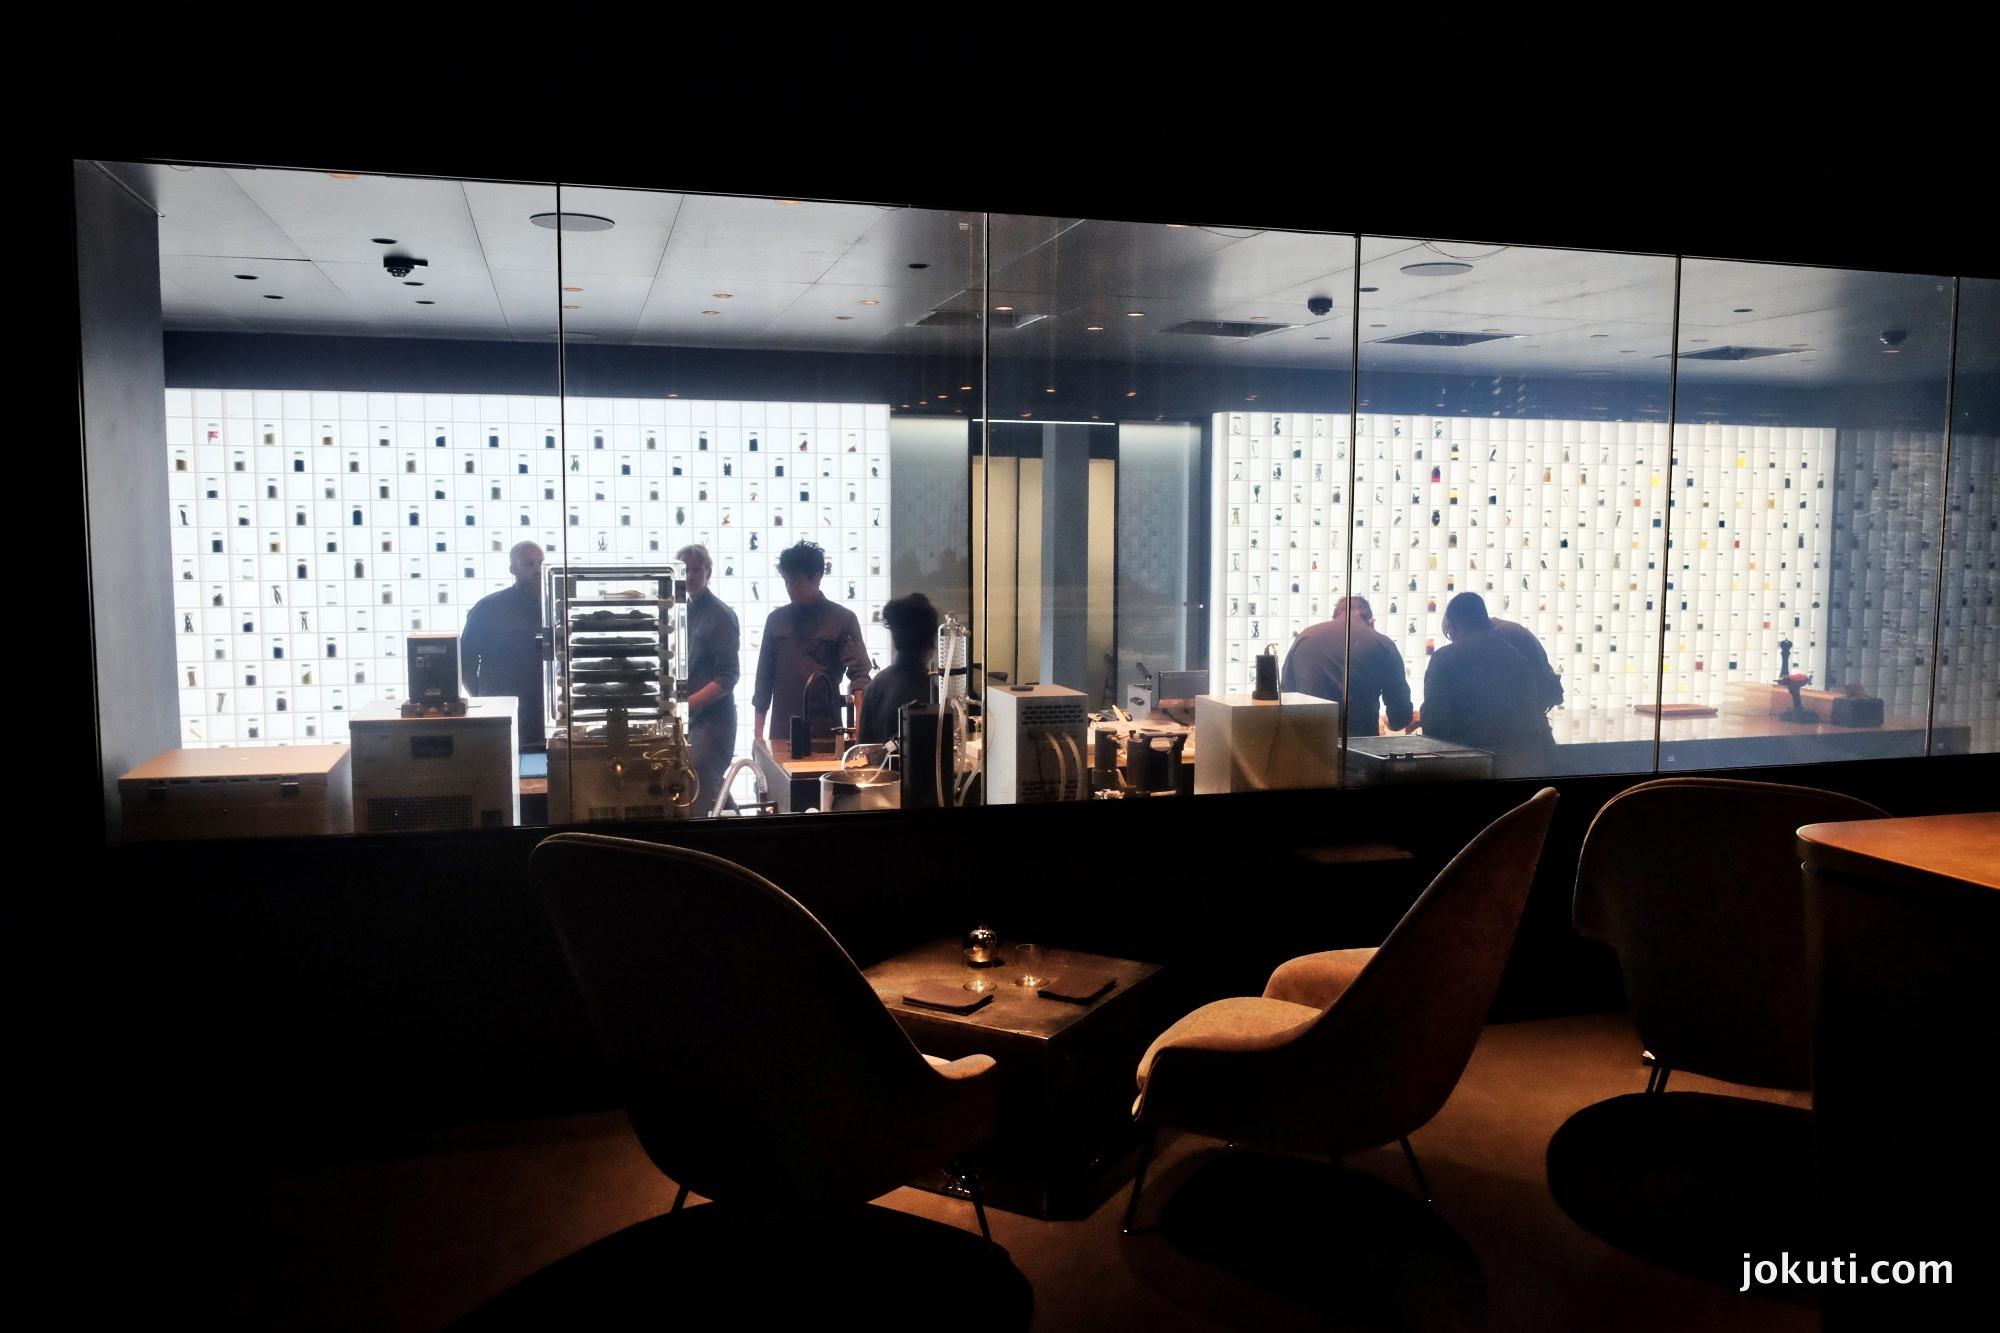 dscf7168_alchemist_copenhagen_rasmus_munk_holistic_dining_restaurant_denmark_vilagevo_jokuti_andras_l.jpg